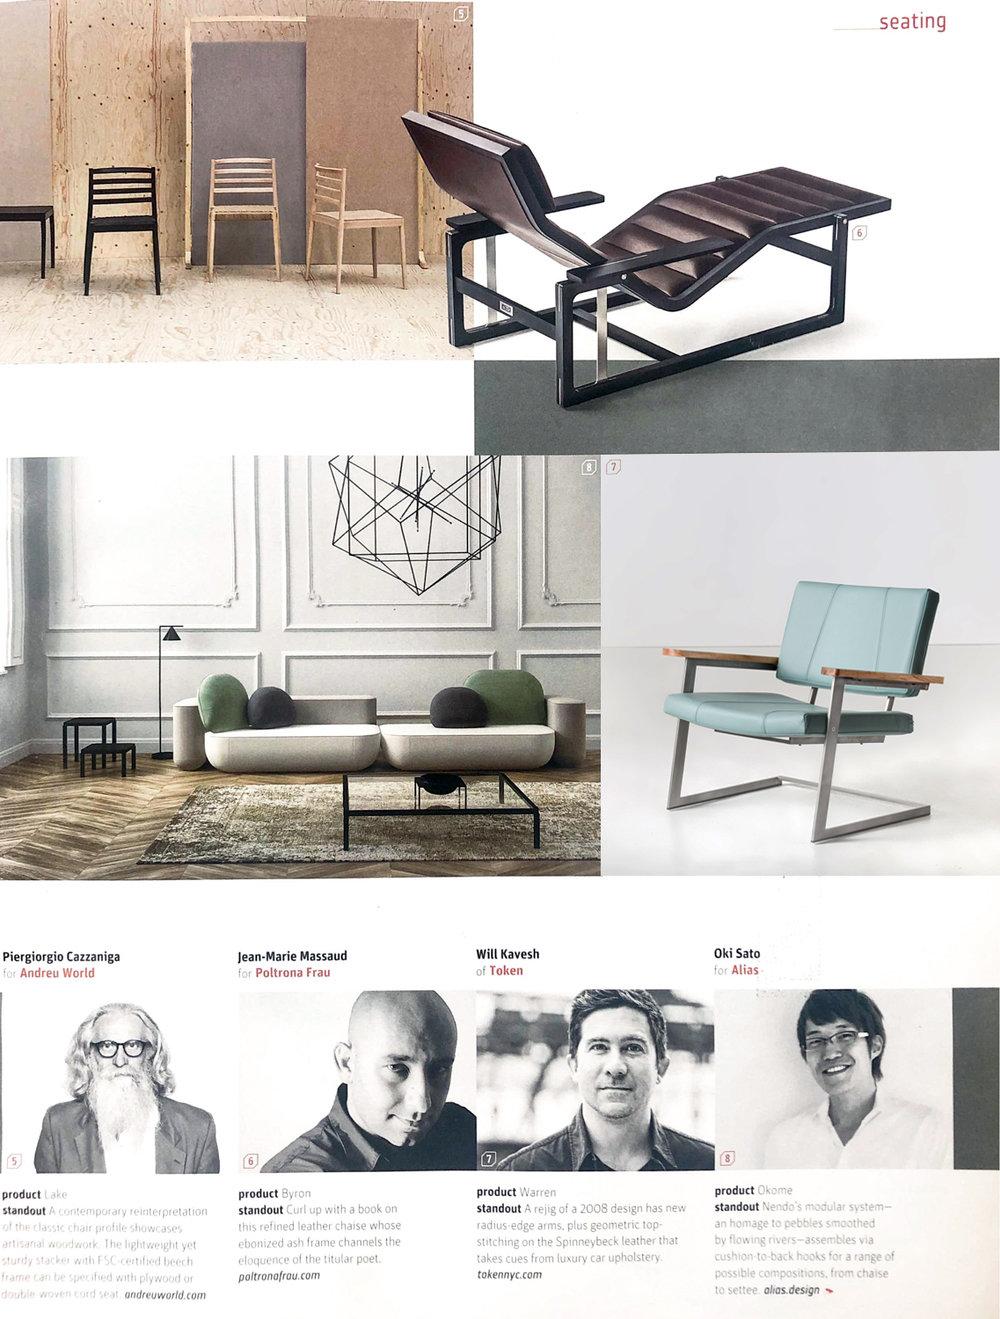 interior_design_market-2 copy.jpg